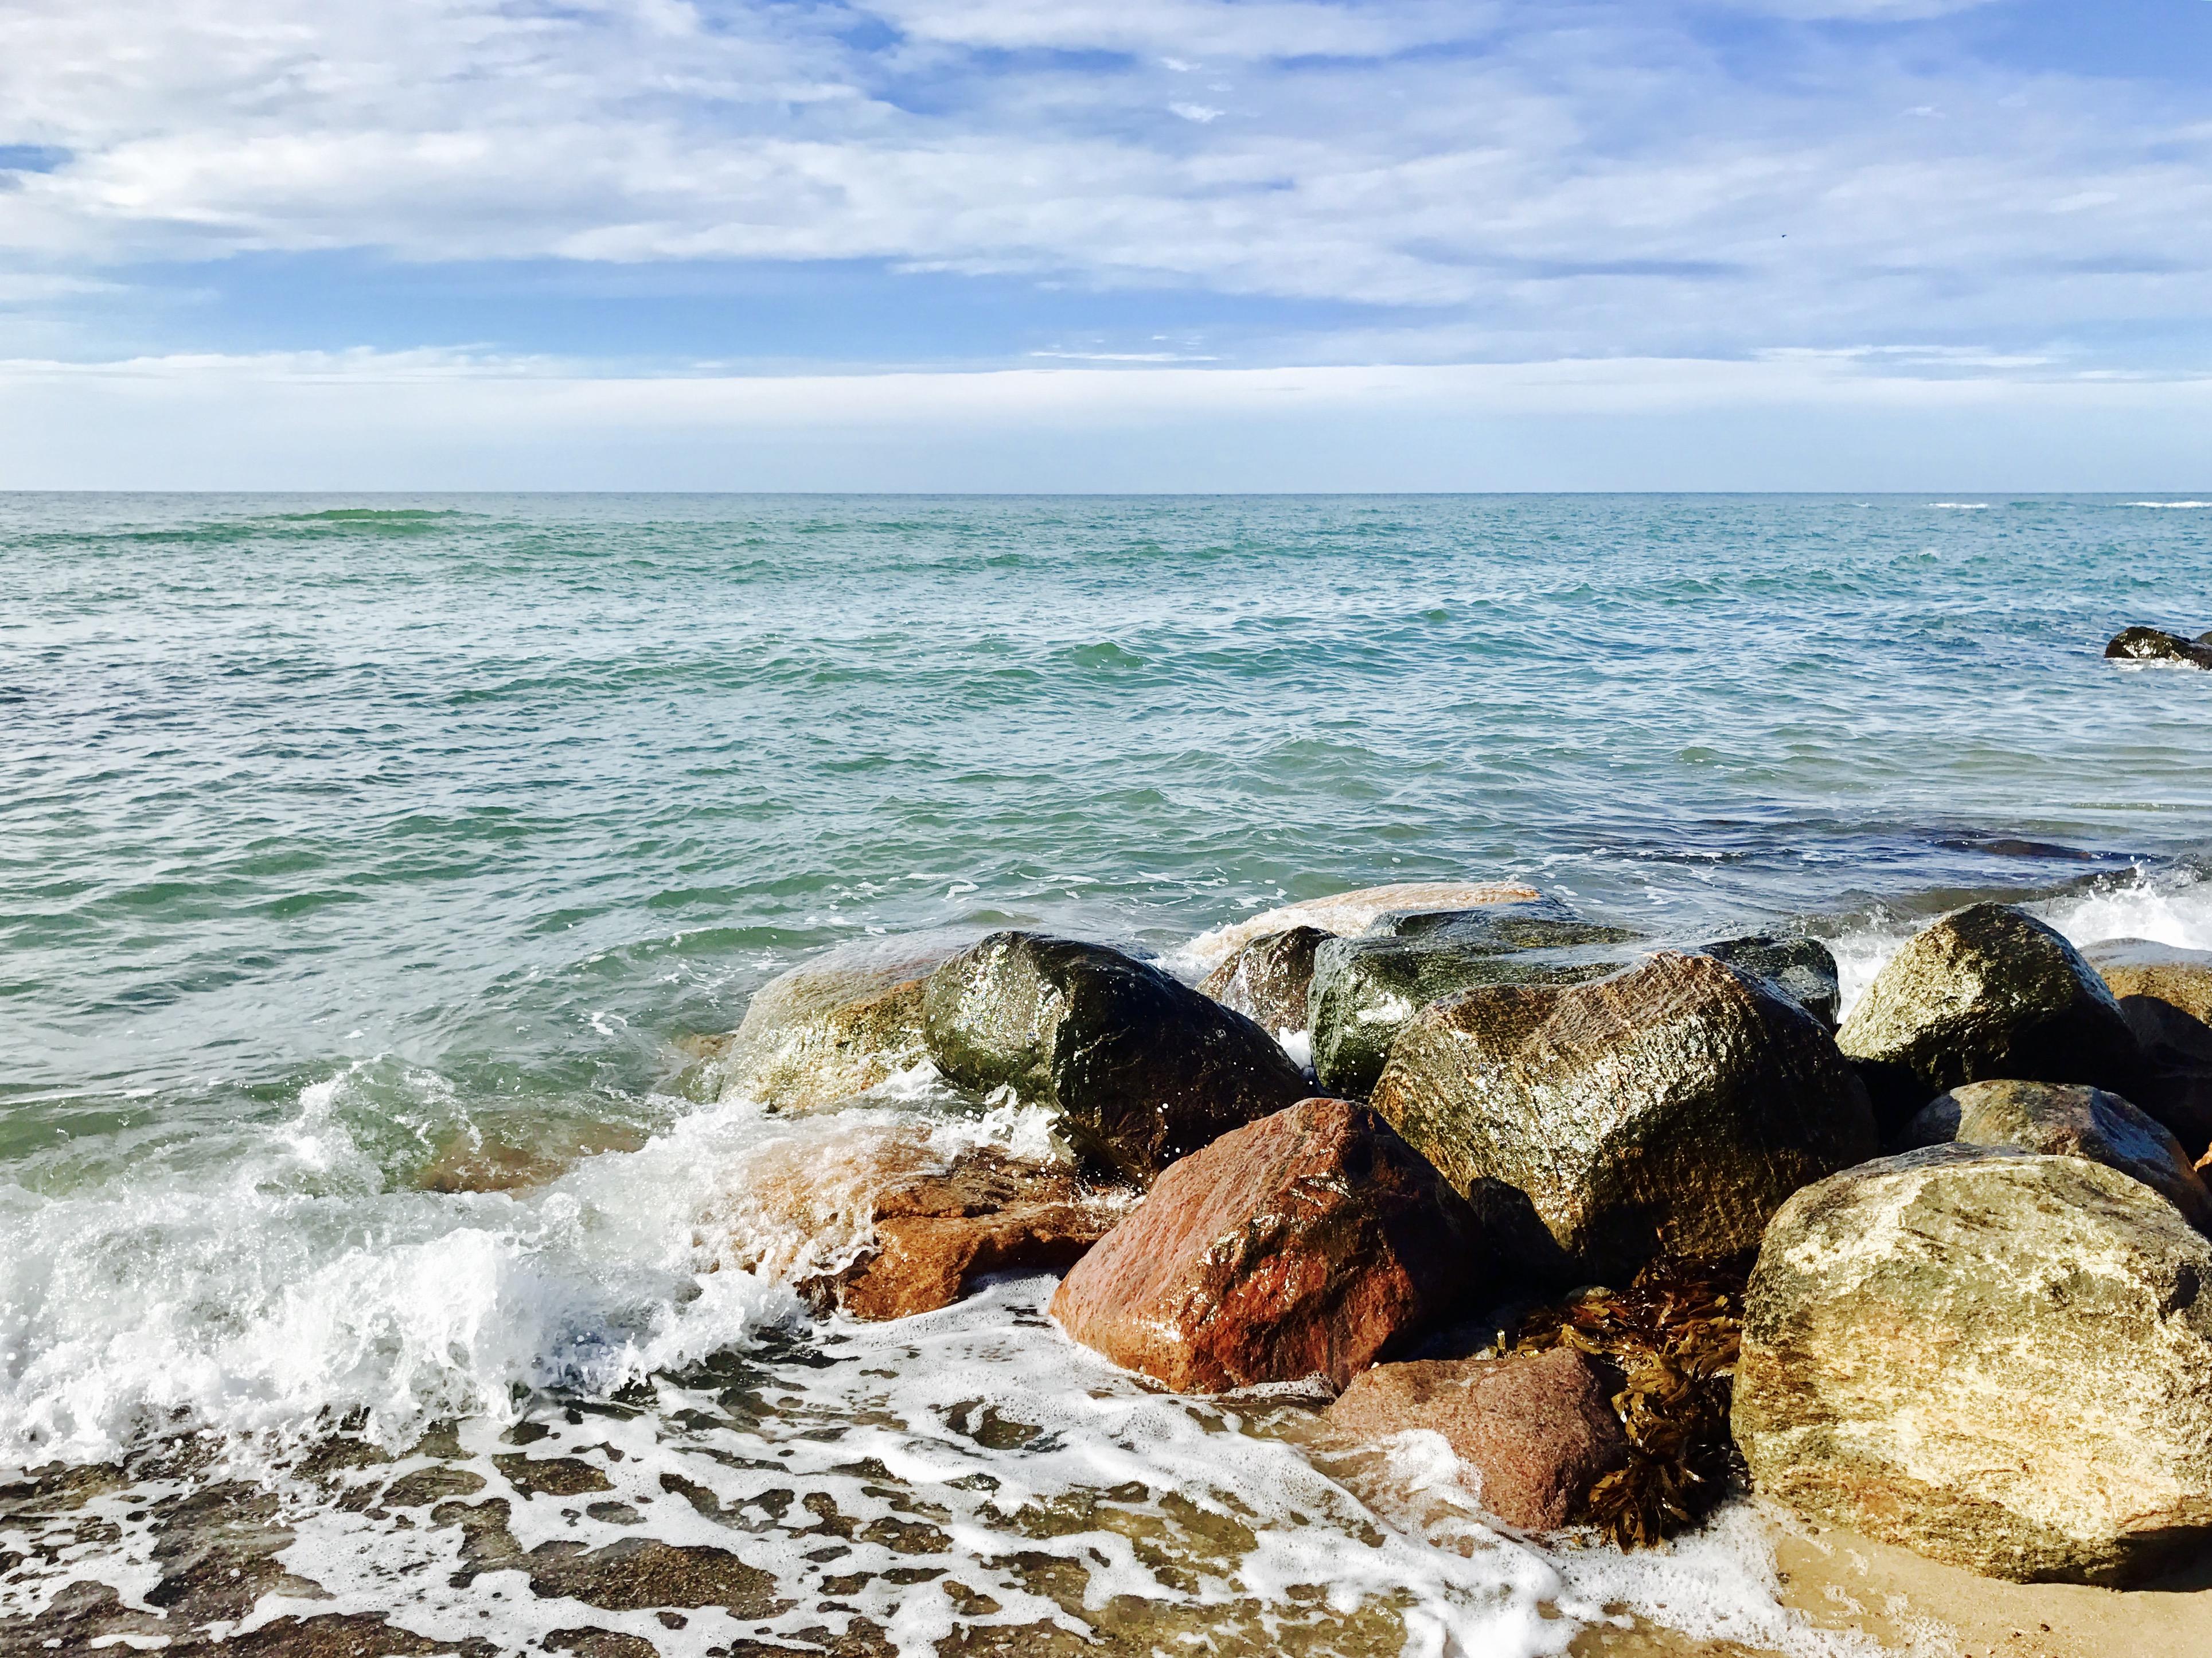 Benefits of a Cold Swim